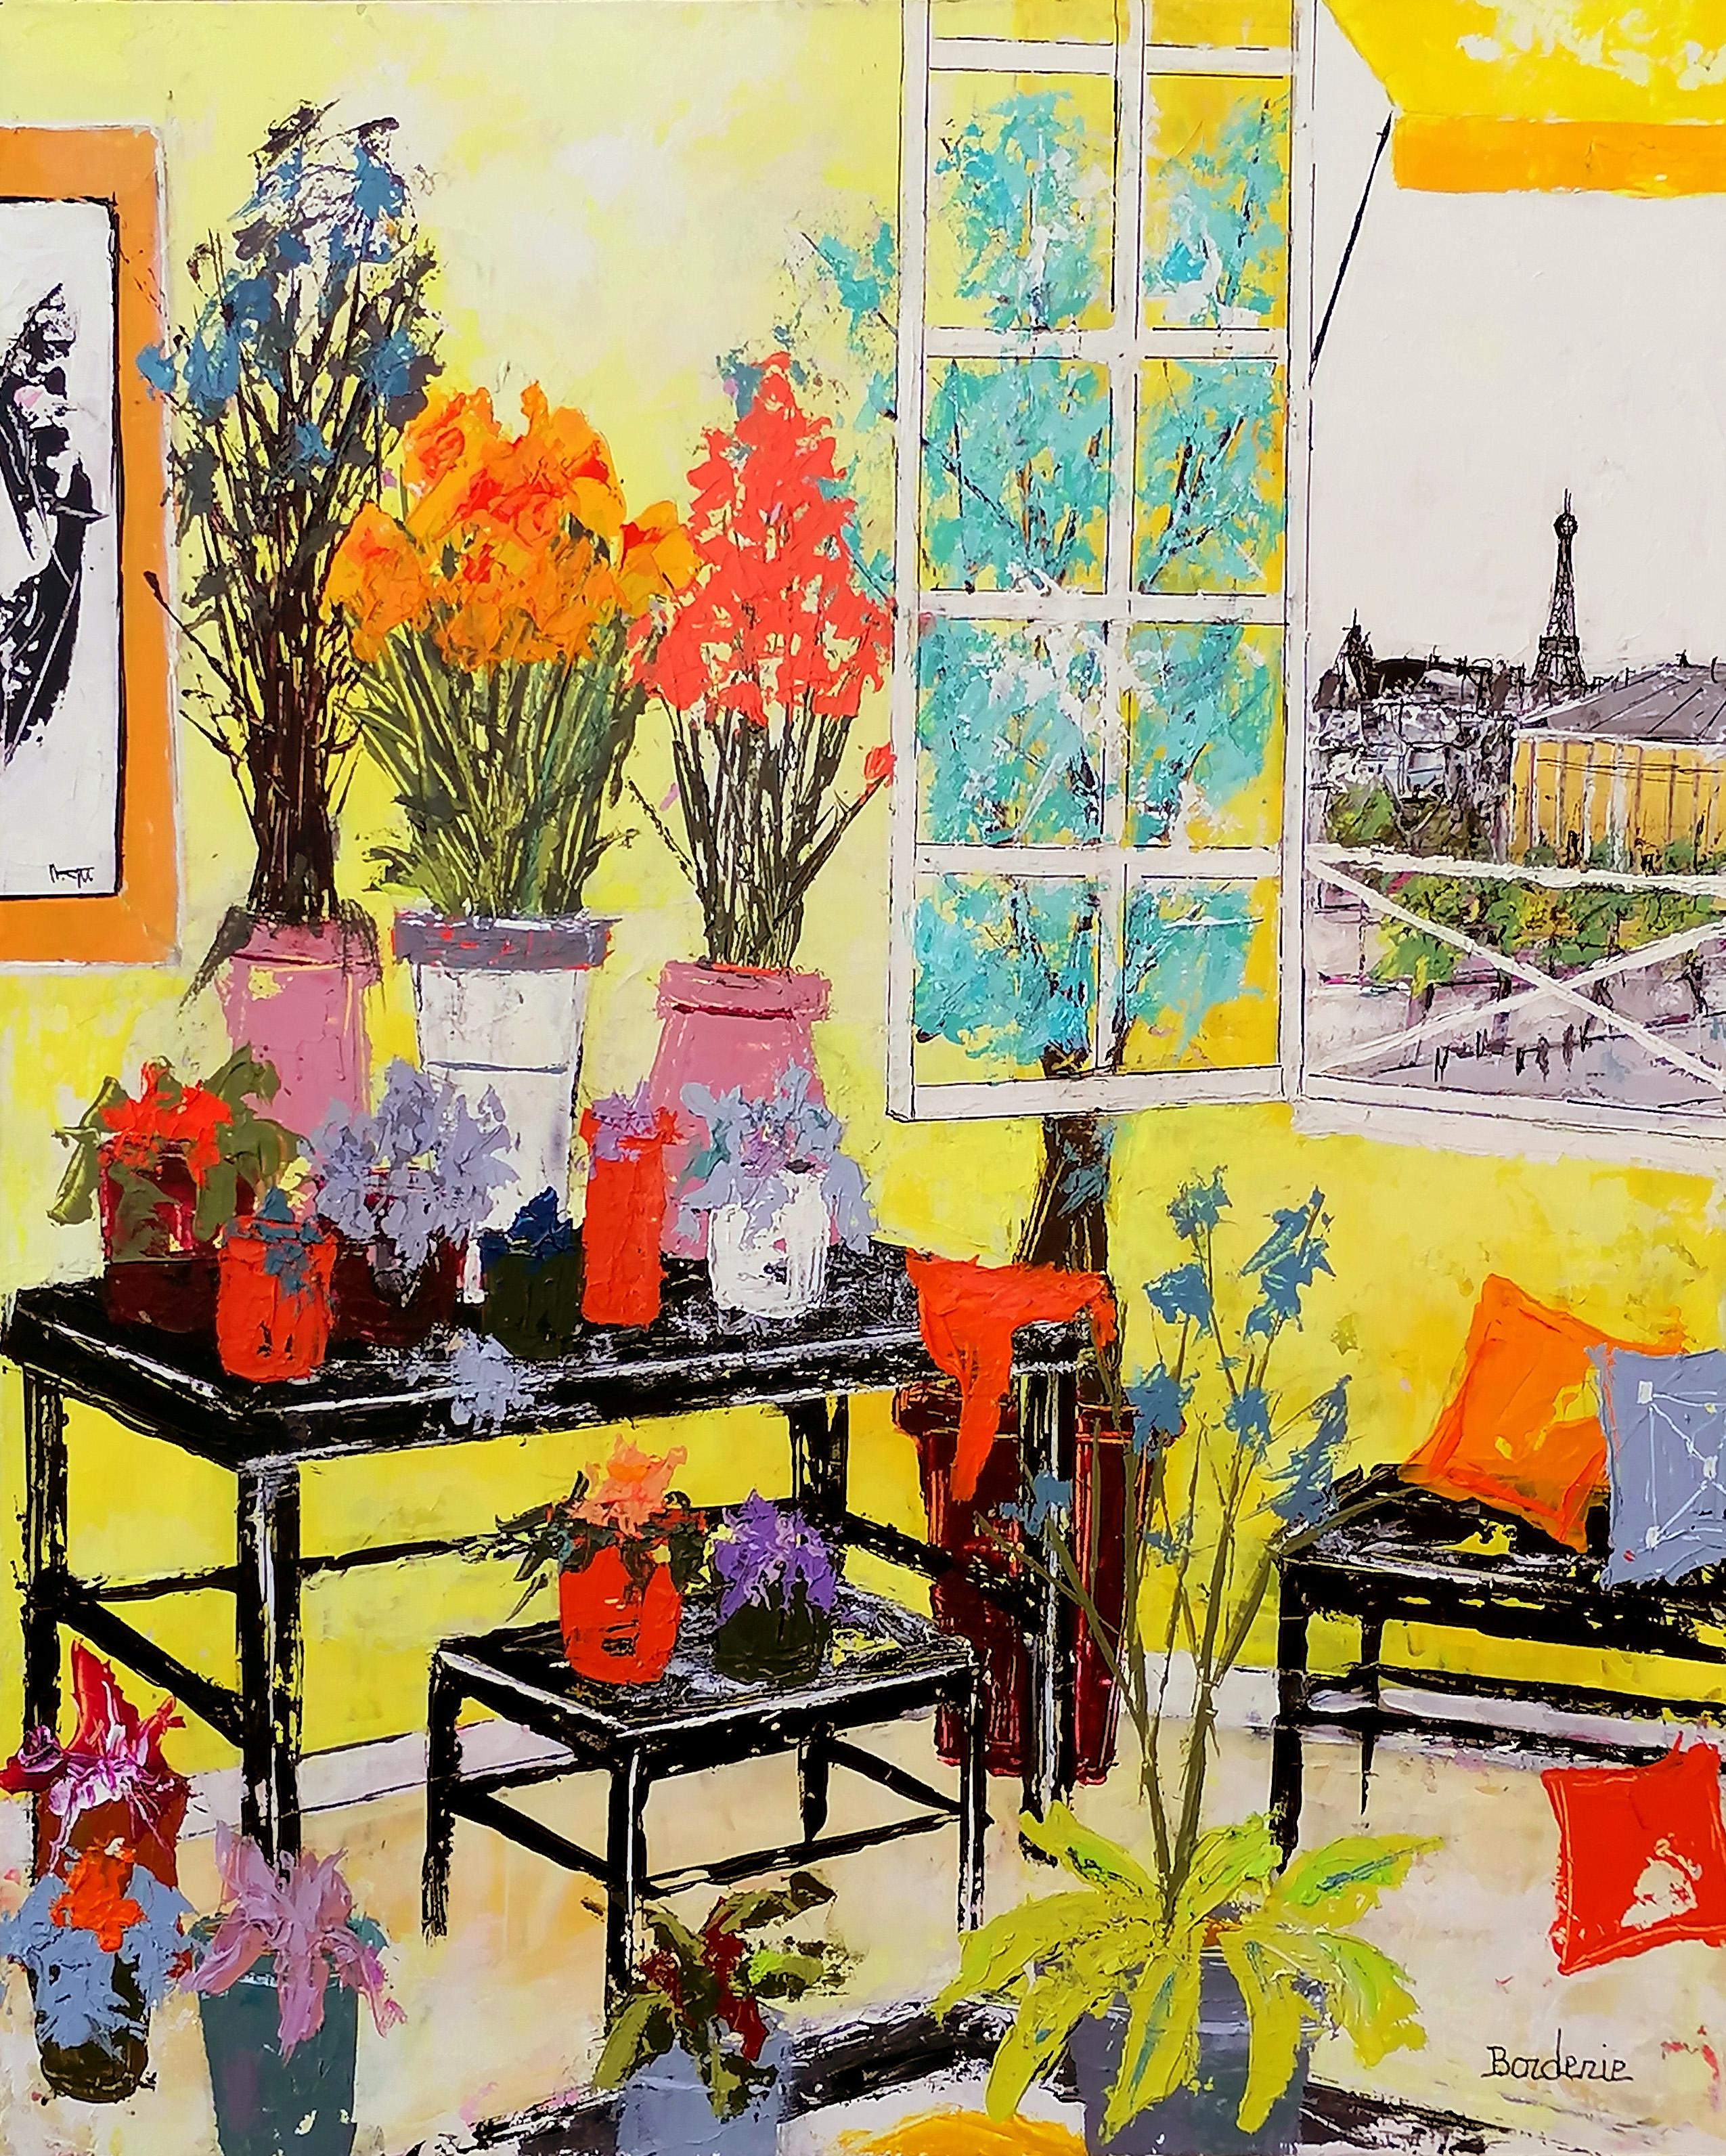 Bouquets fond jaune 10F